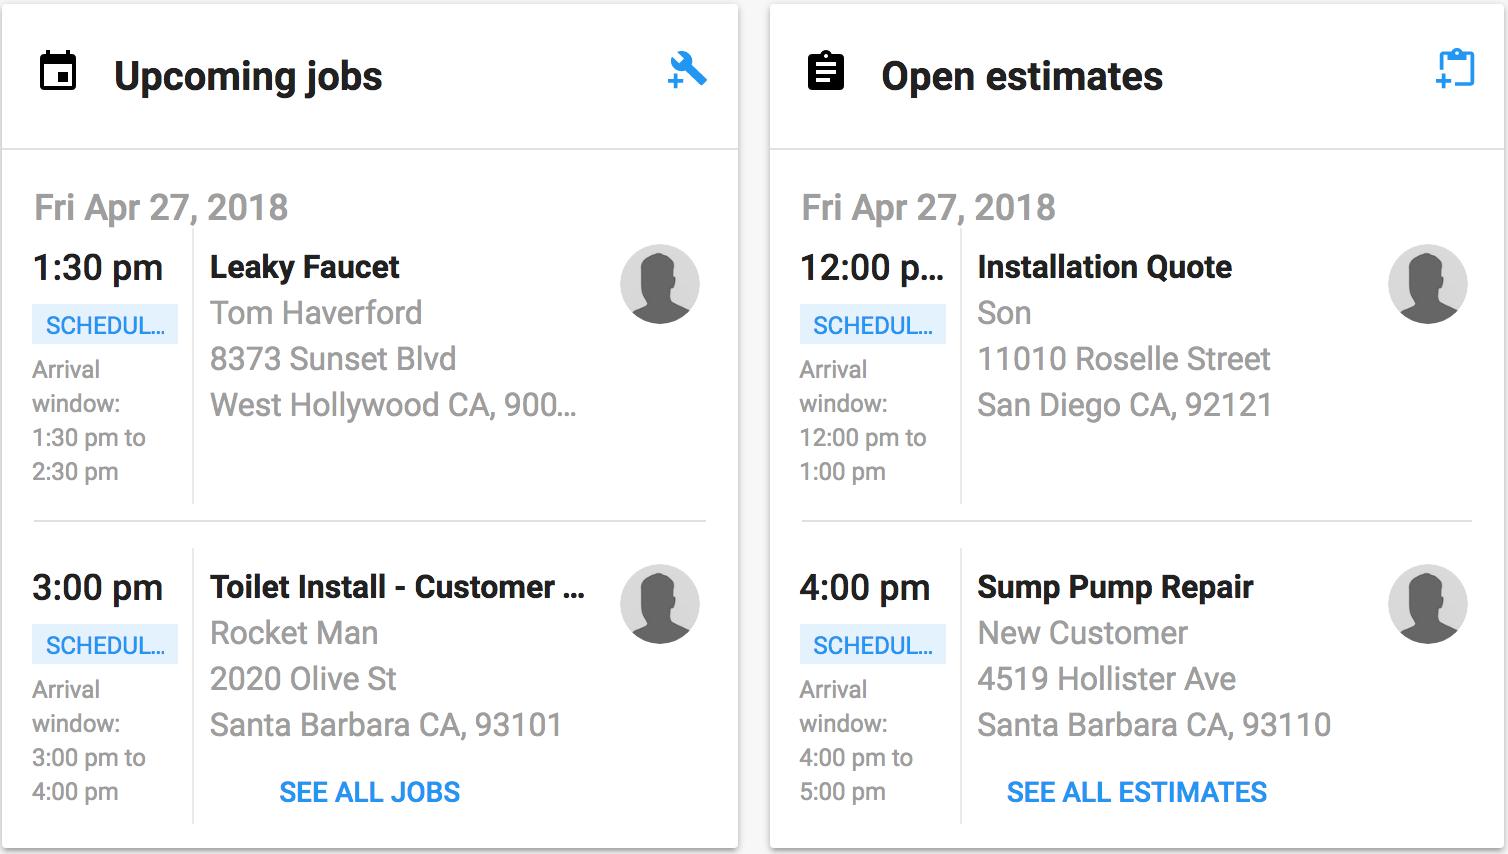 Open Estimates, Upcoming Jobs widgets